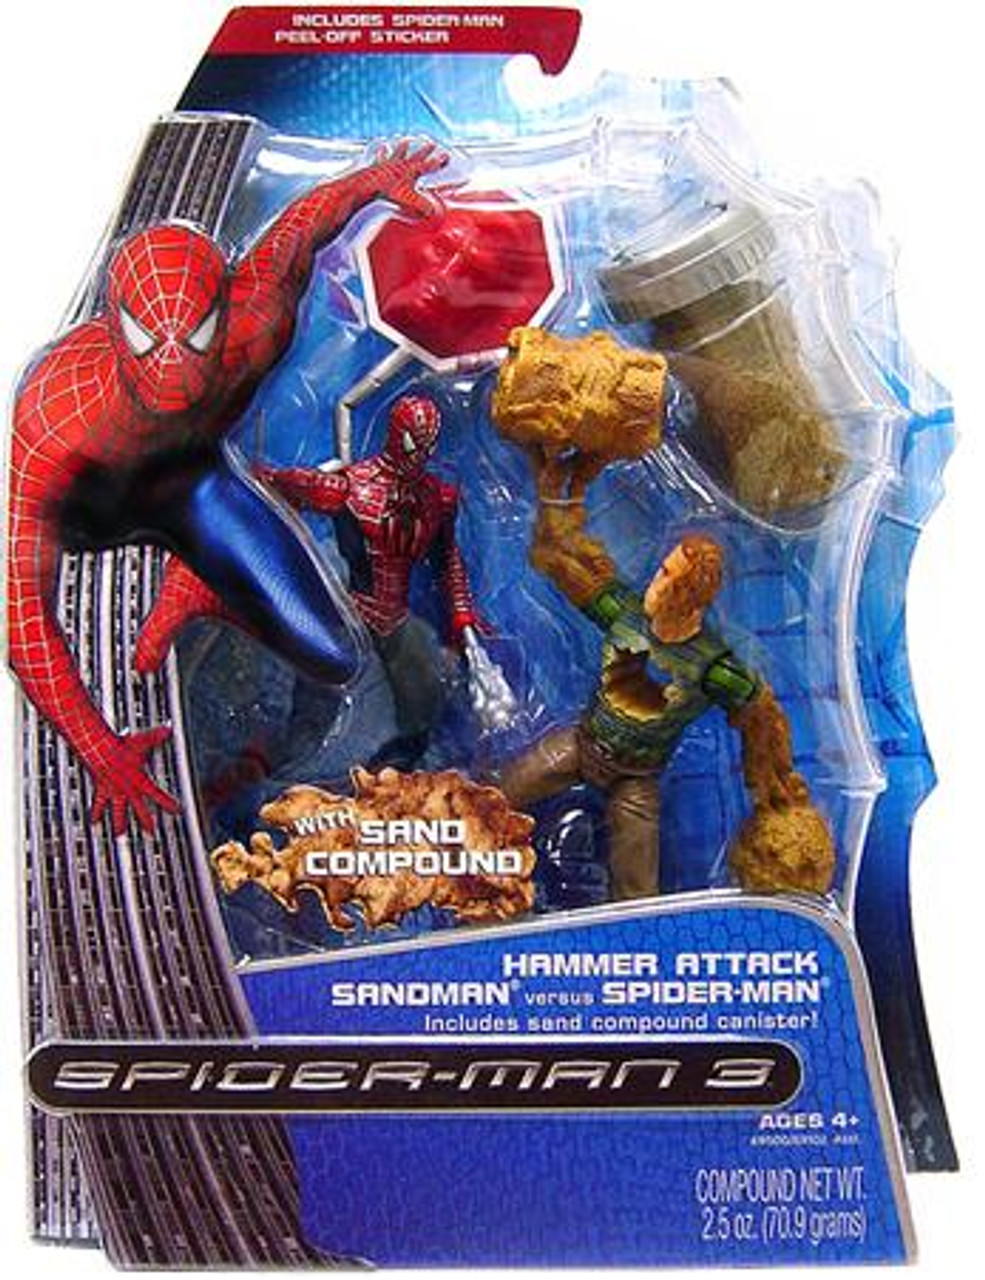 Spider-Man 3 Hammer Attack Sandman vs. Spider-Man Action Figure 2-Pack